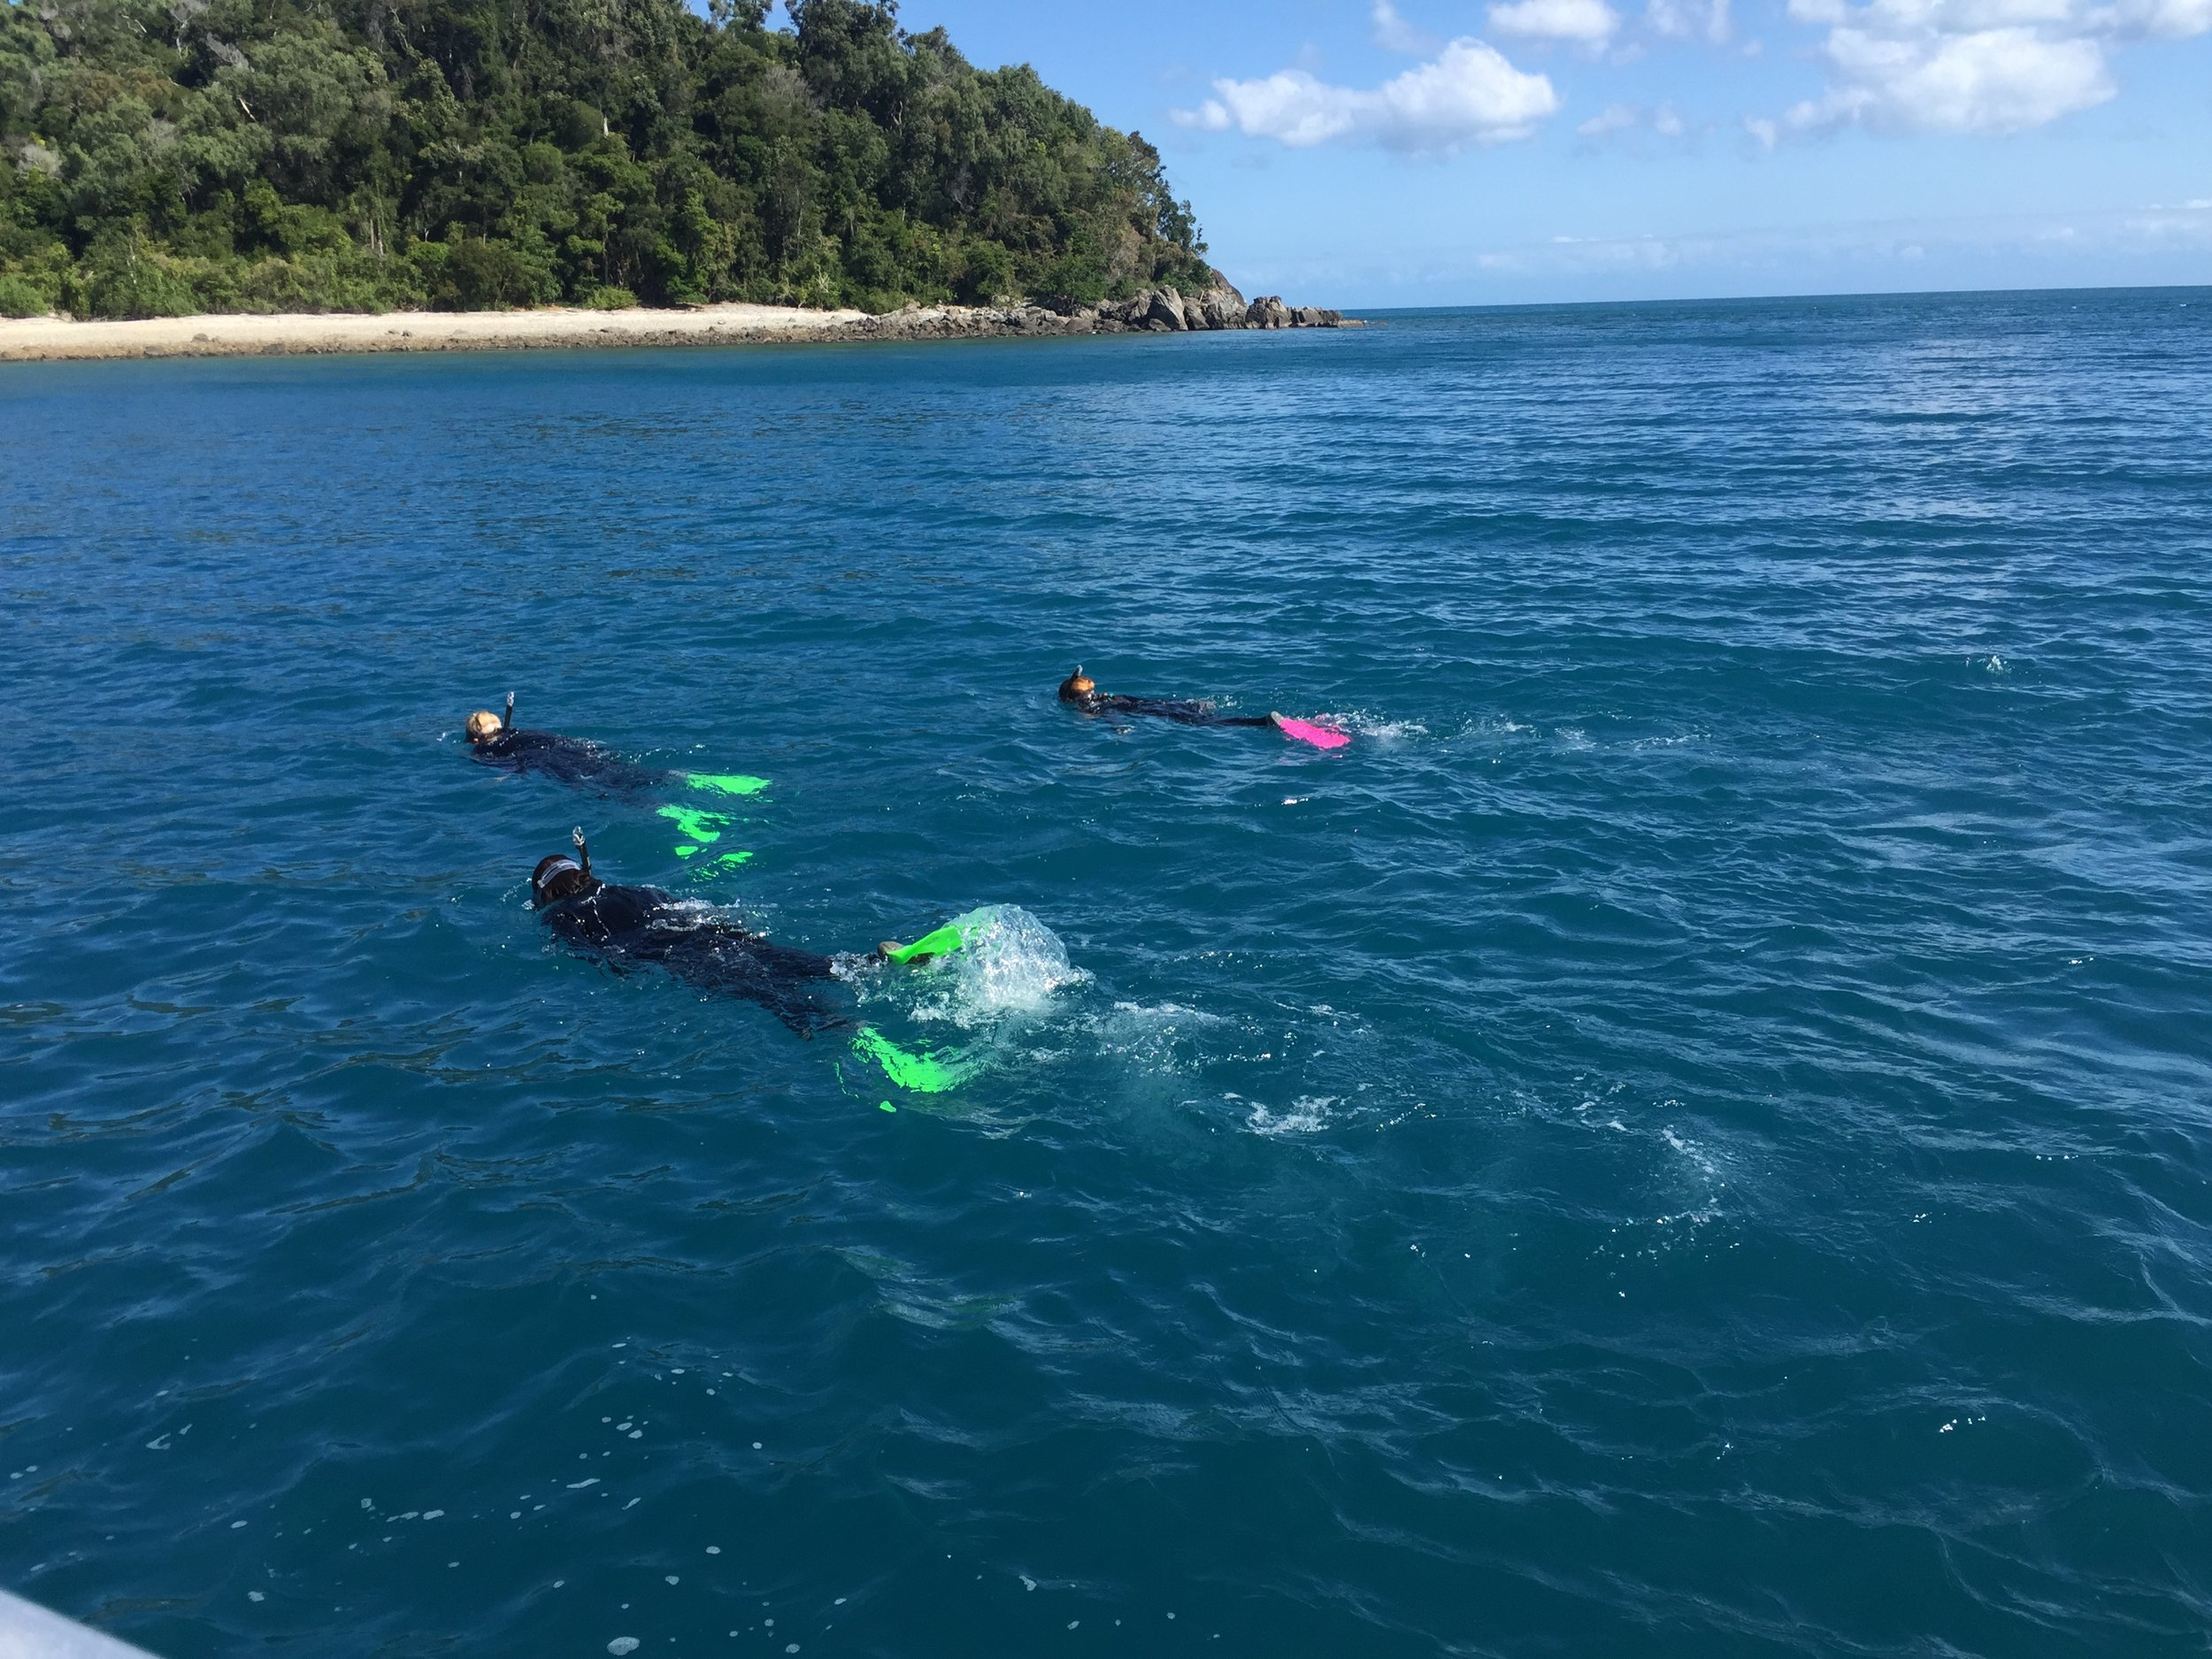 Partake in some snorkeling